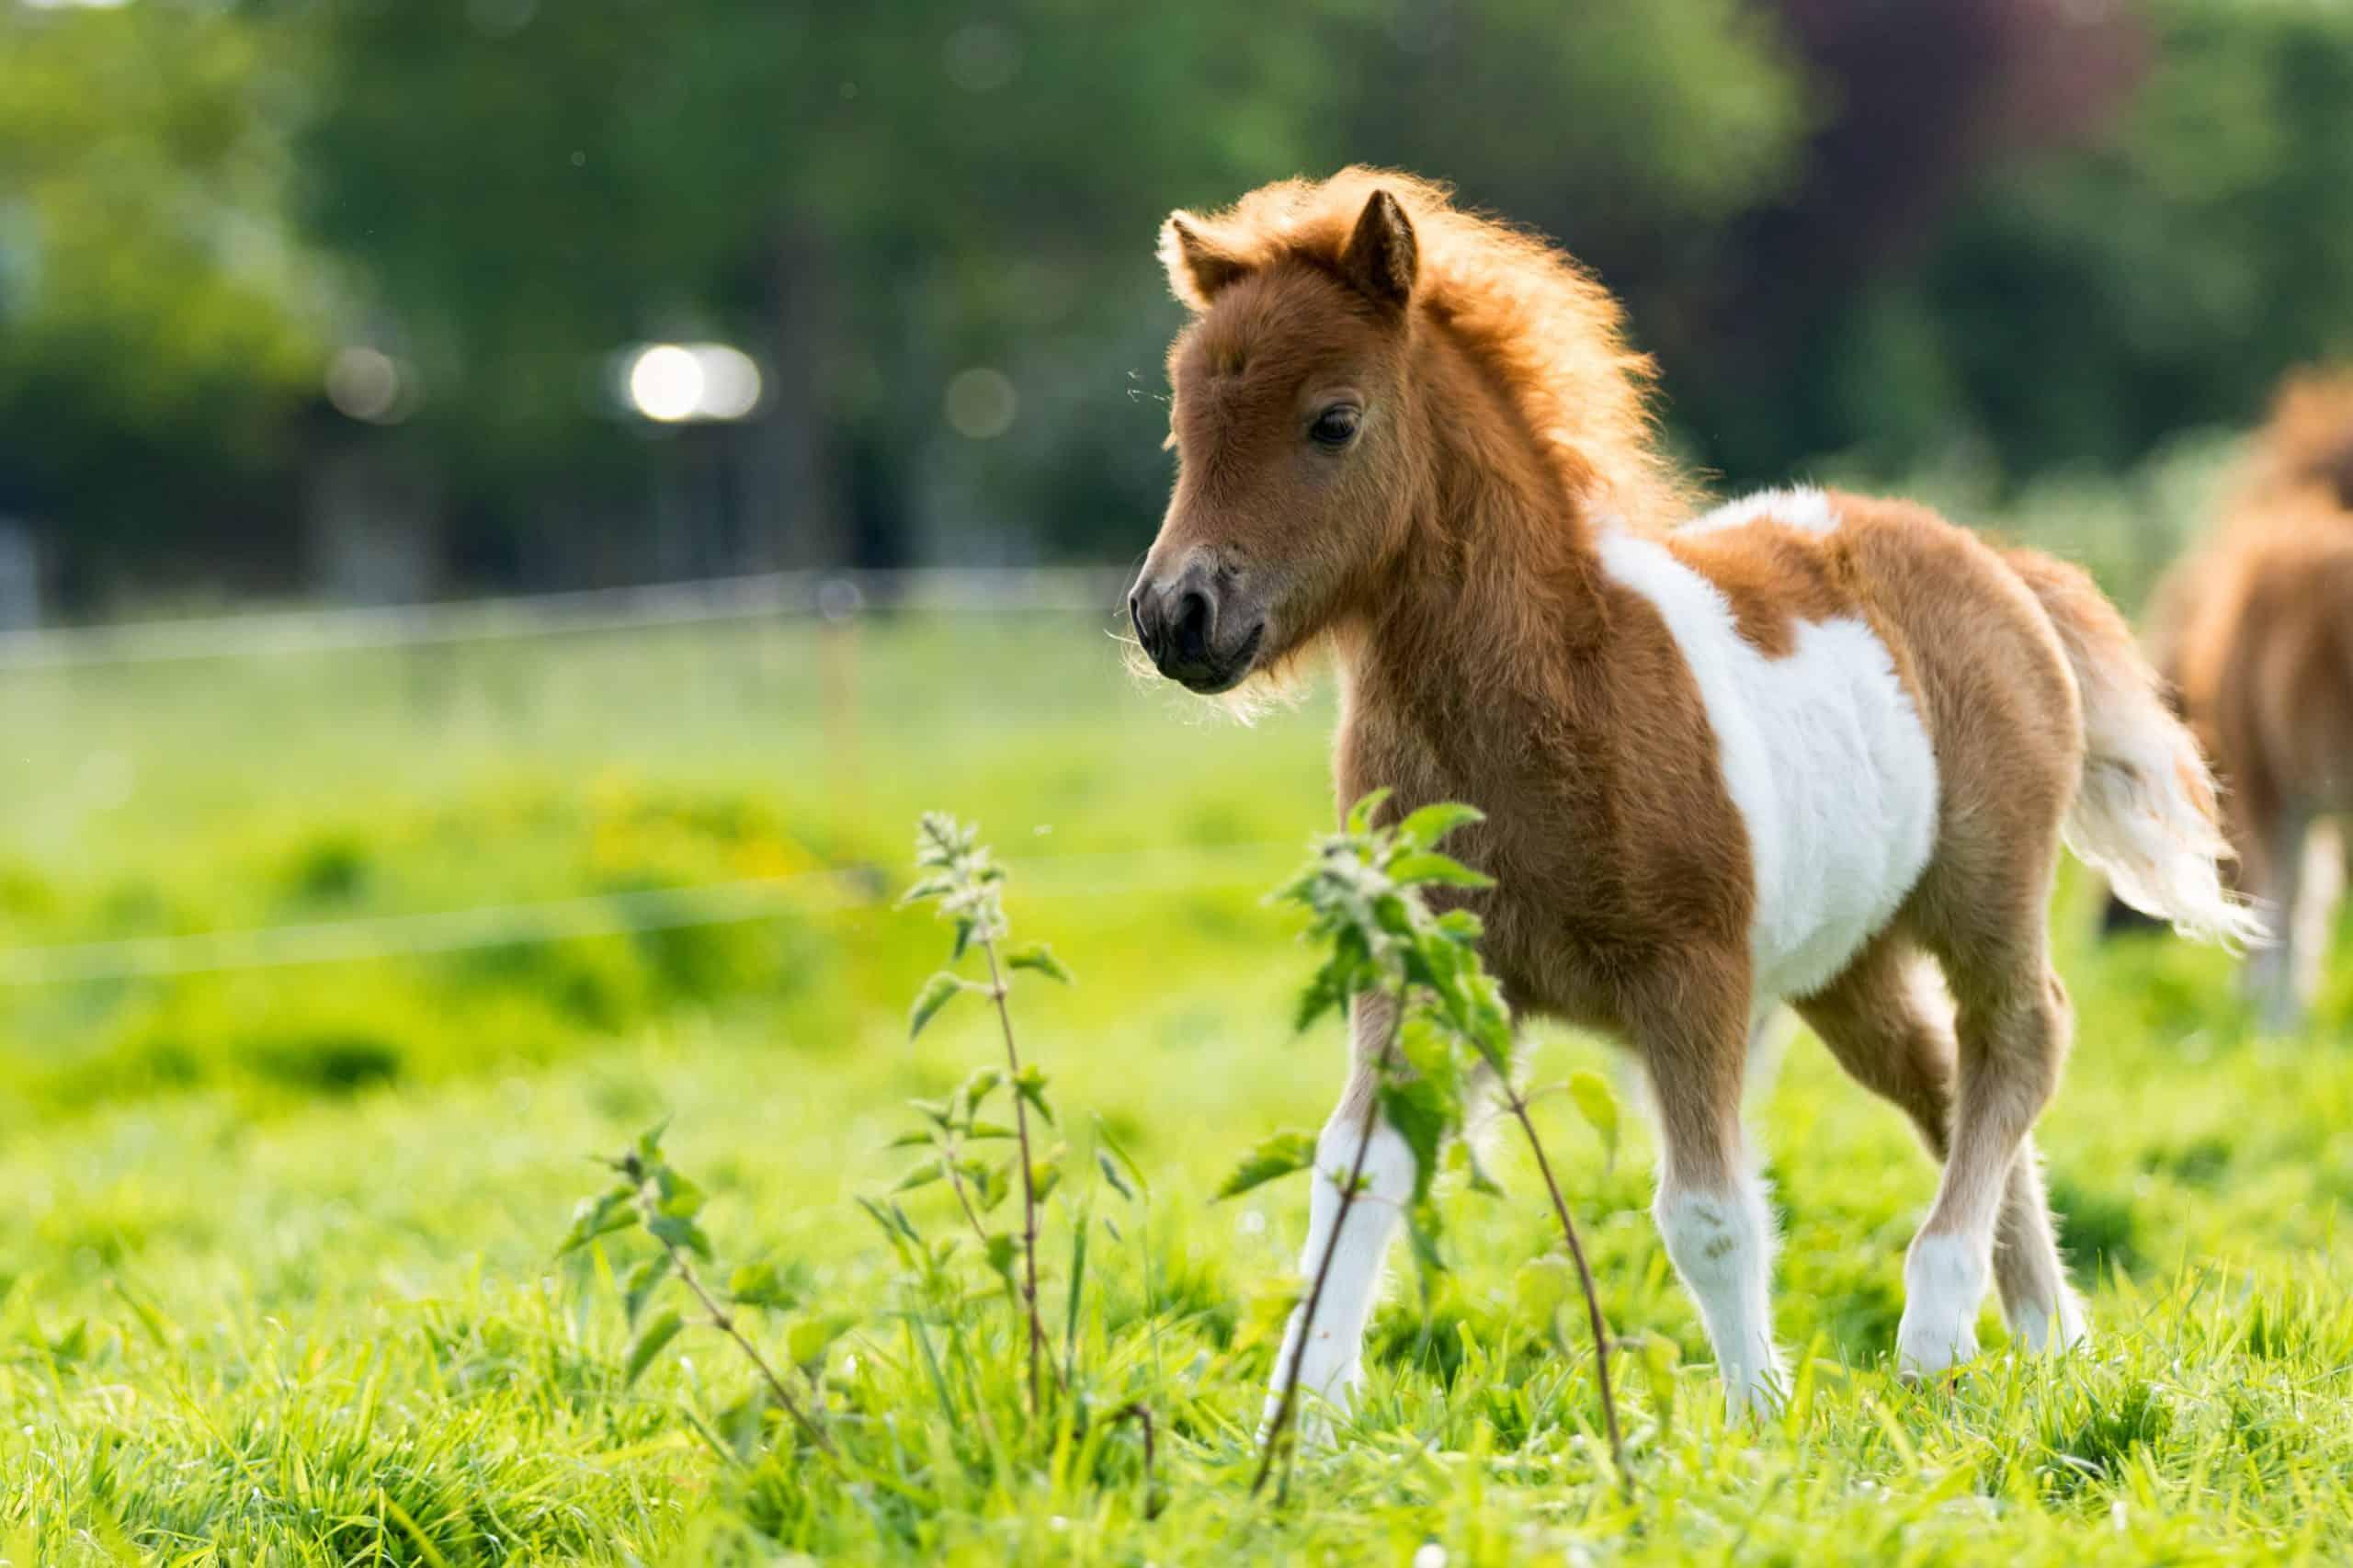 Cute shetland foal walking throguh the meadow, exploring the world.